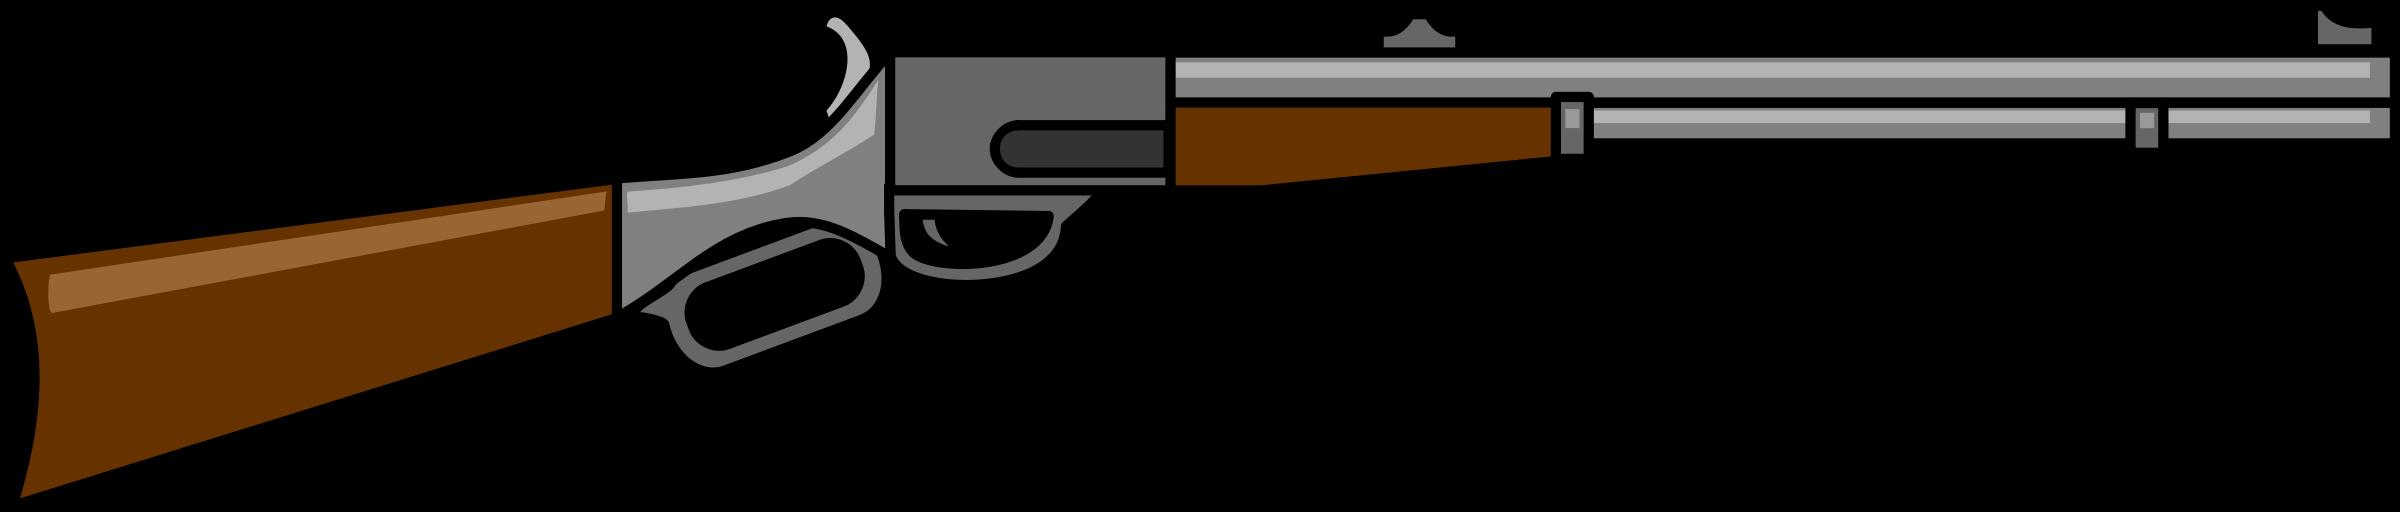 Big image png. Clipart gun real gun